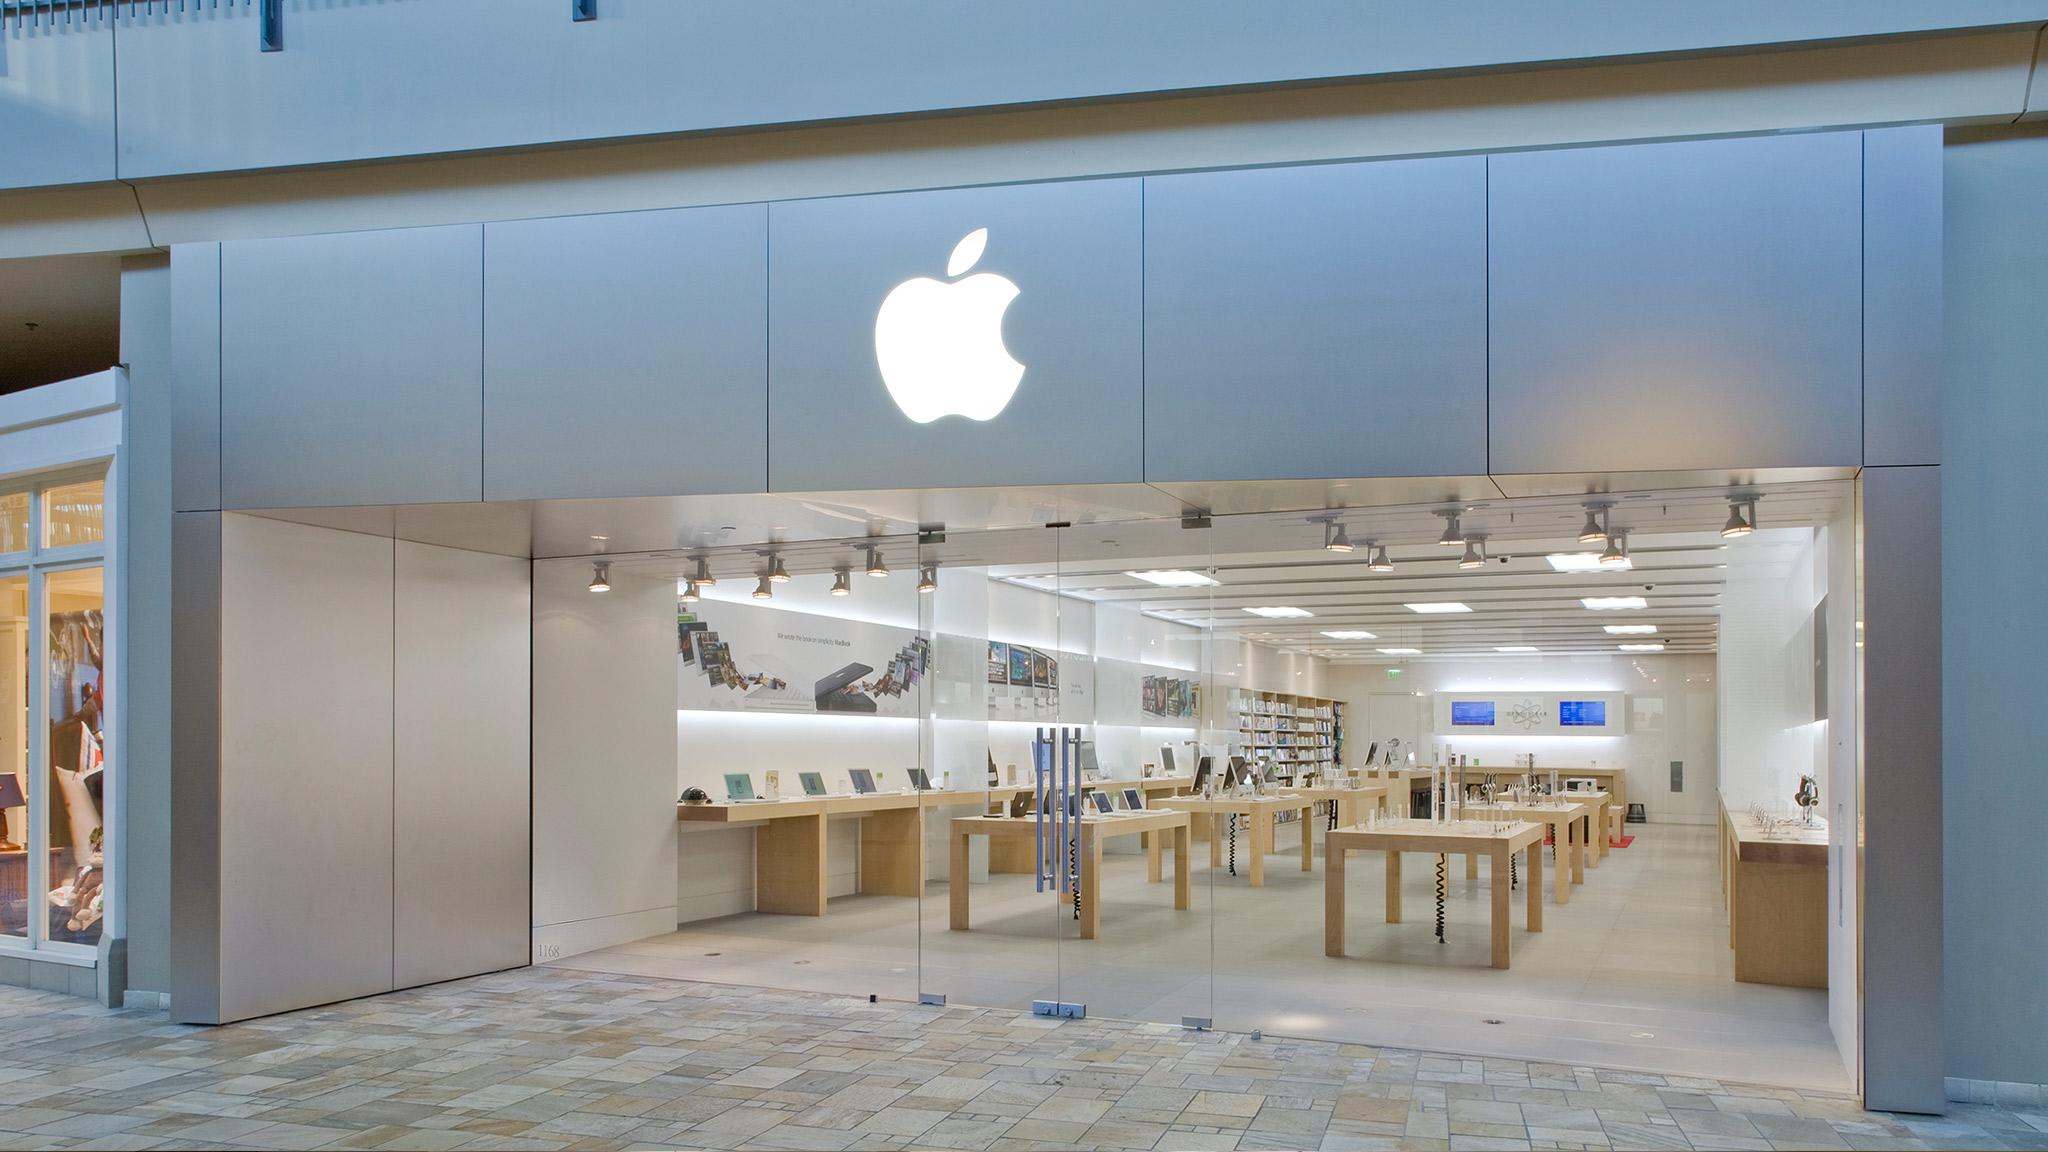 Apple FlatIron Crossing image 0